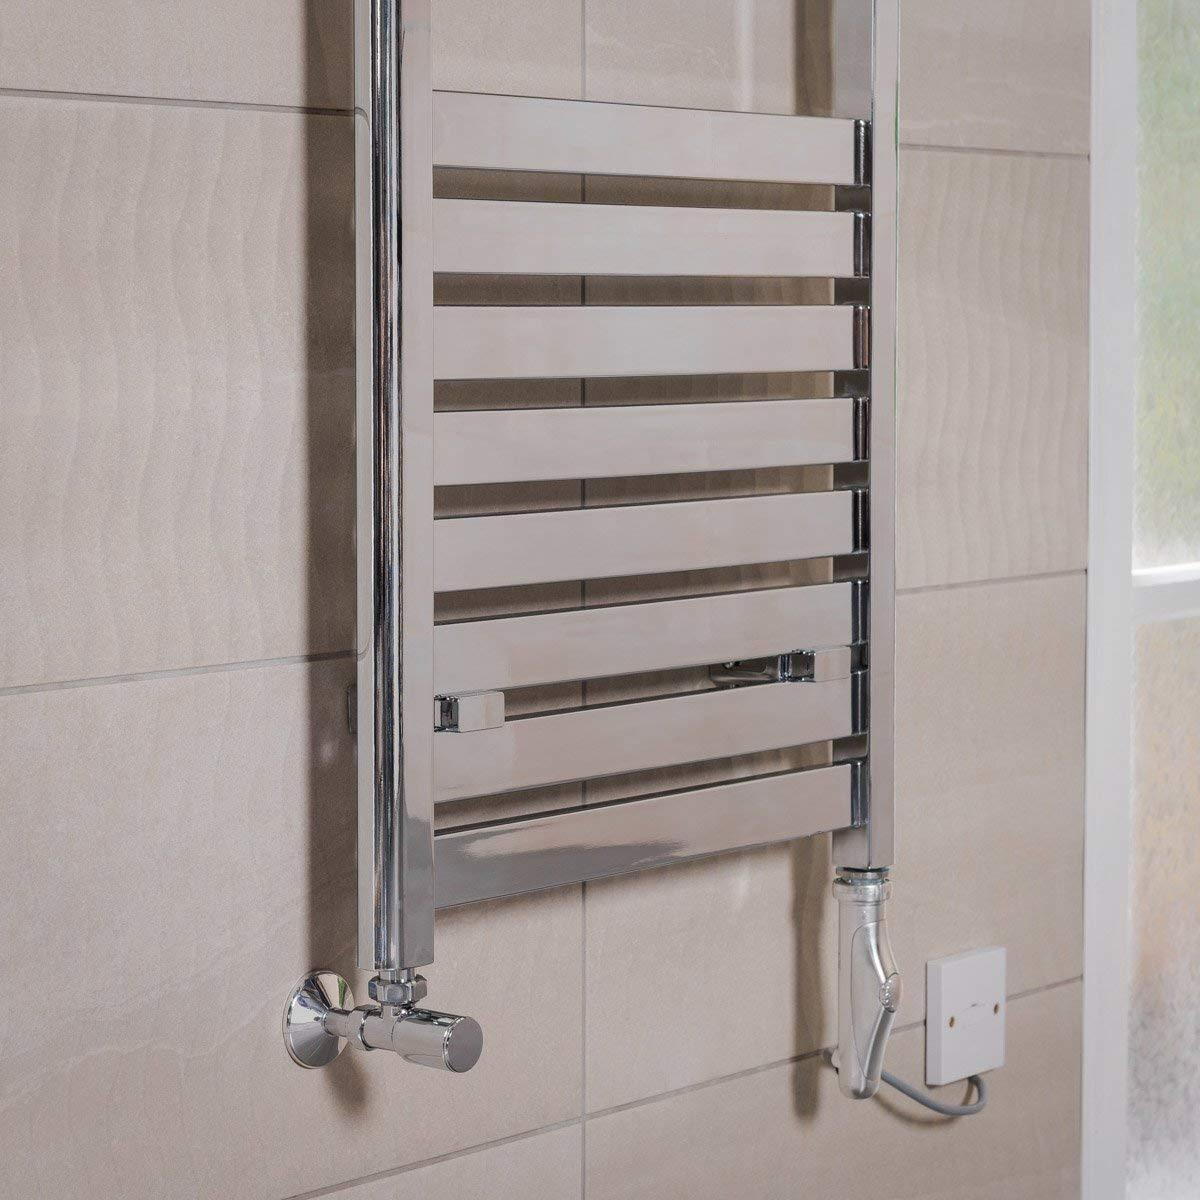 Chrome WarmeHaus Designer Flat Panel Bathroom Electric Heated Towel Rail Radiator Kit 1200 x 500